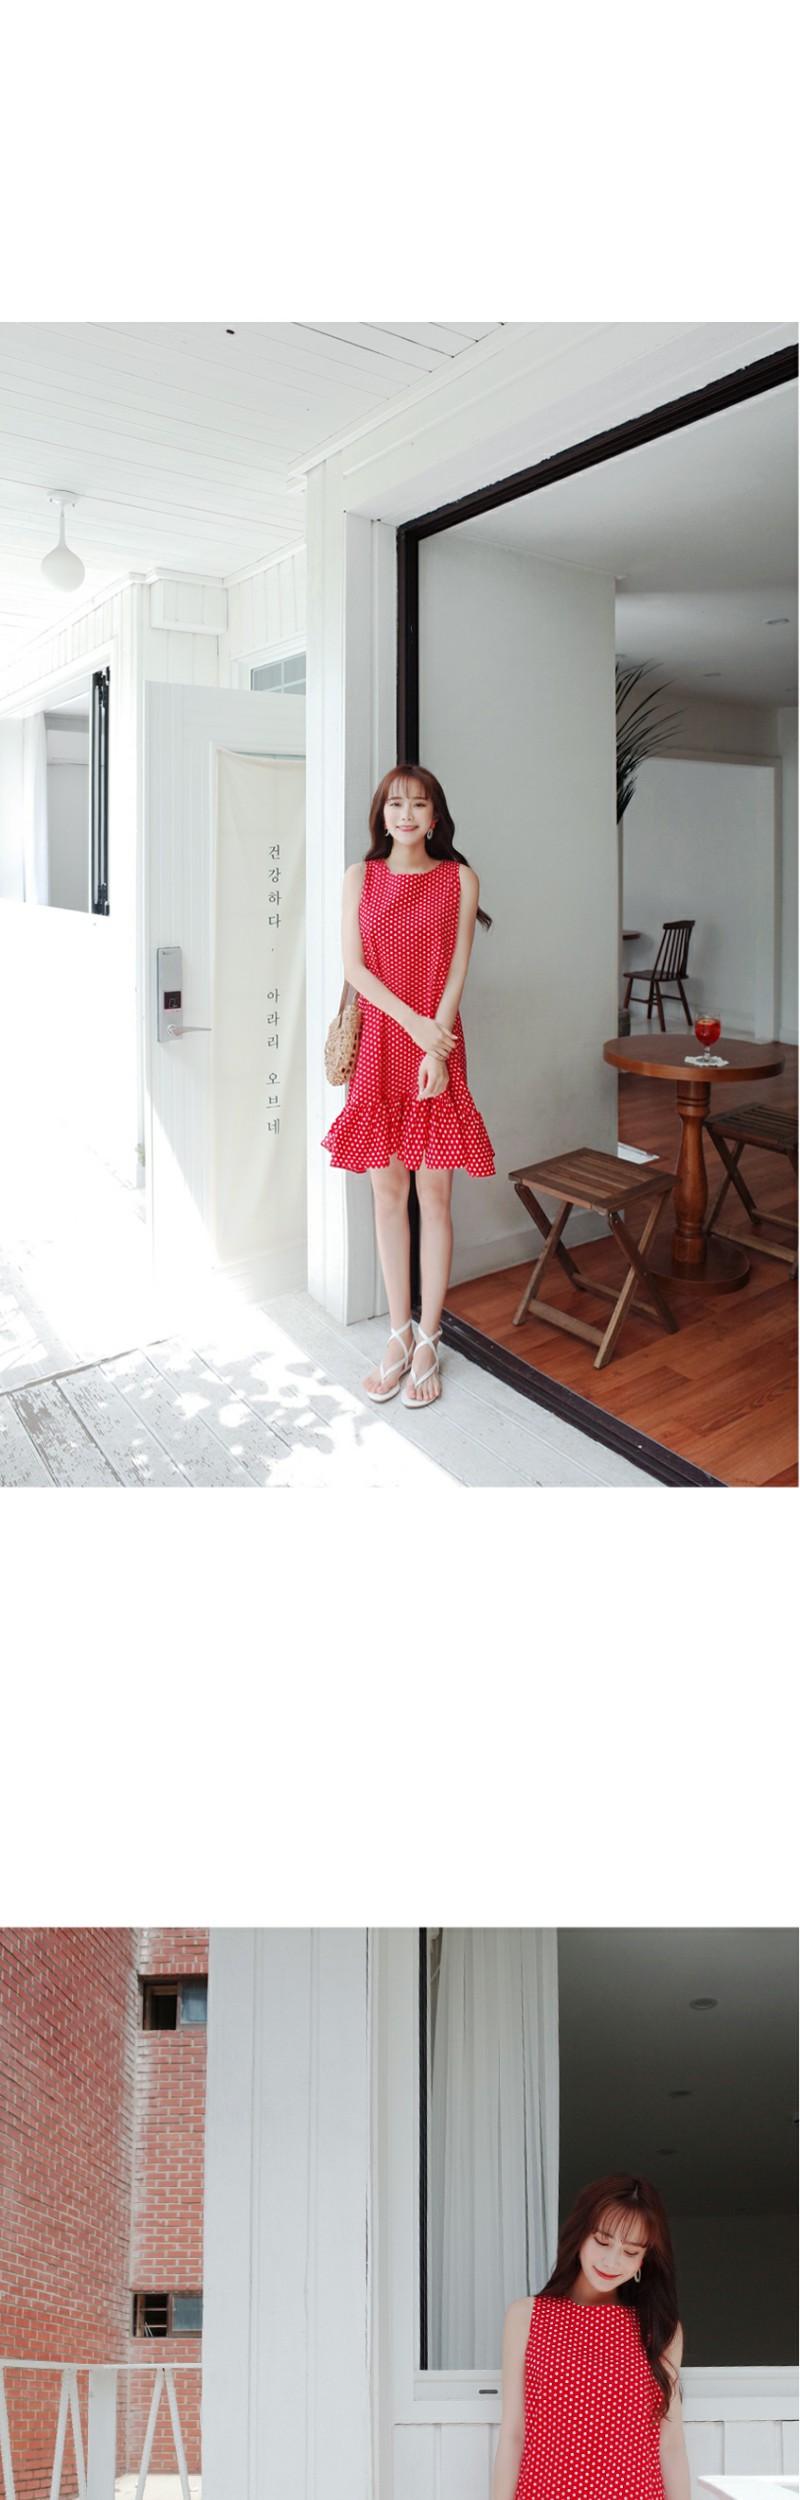 Dot dress with ribbon